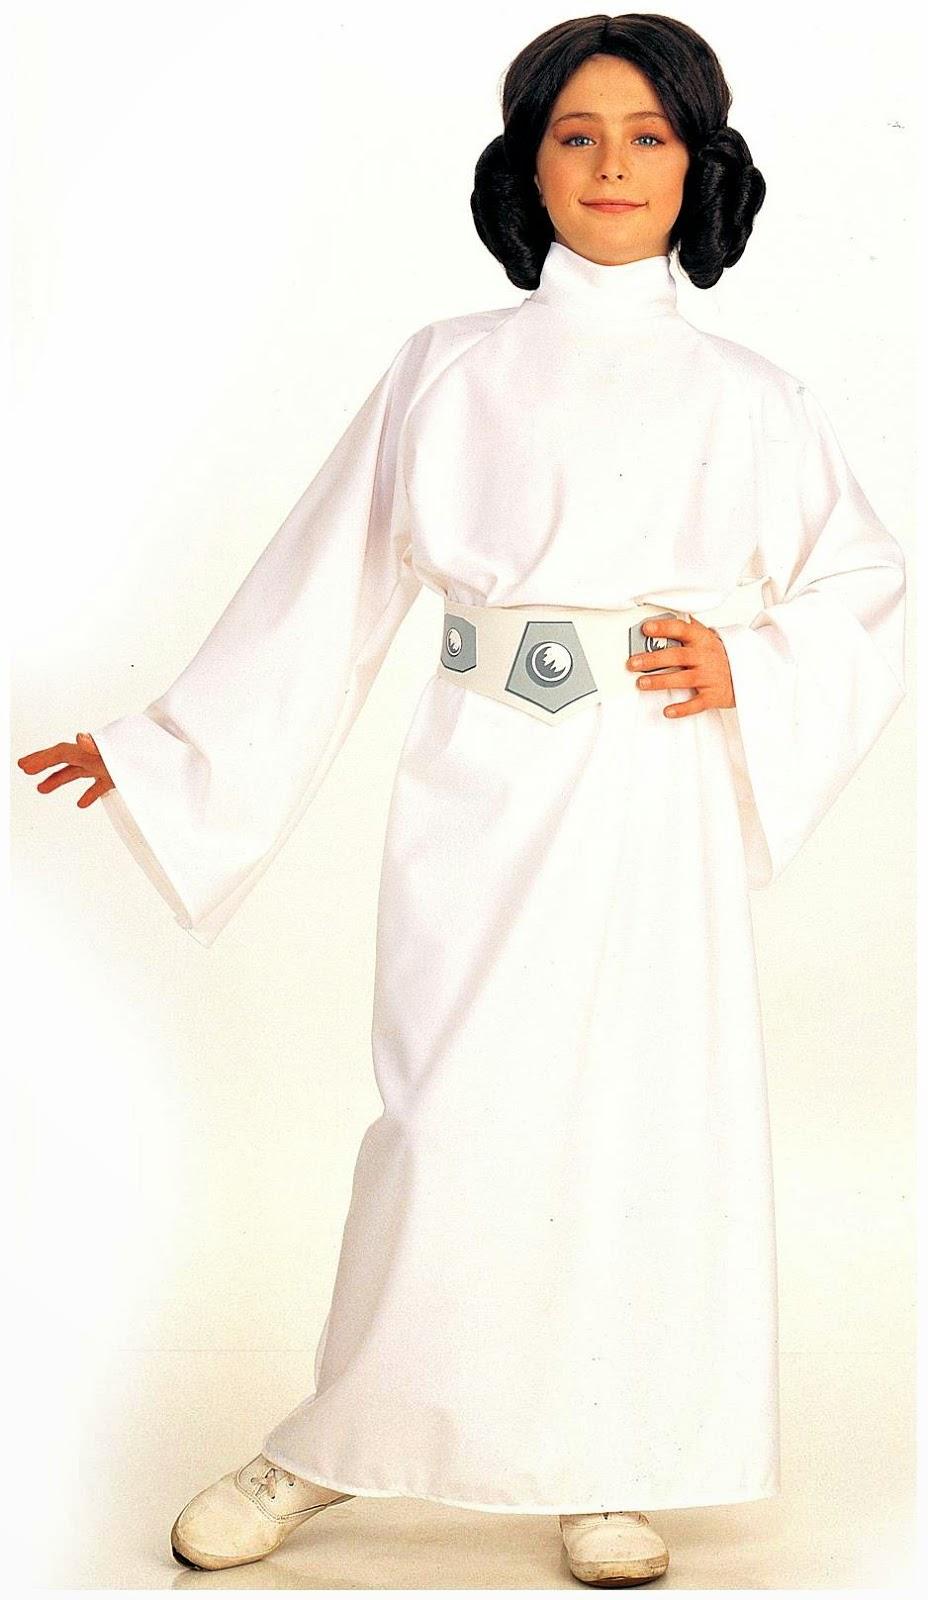 Leia Star Wars Disney Girls Costume Kids Fancy Dress Outfit Jedi Offical License